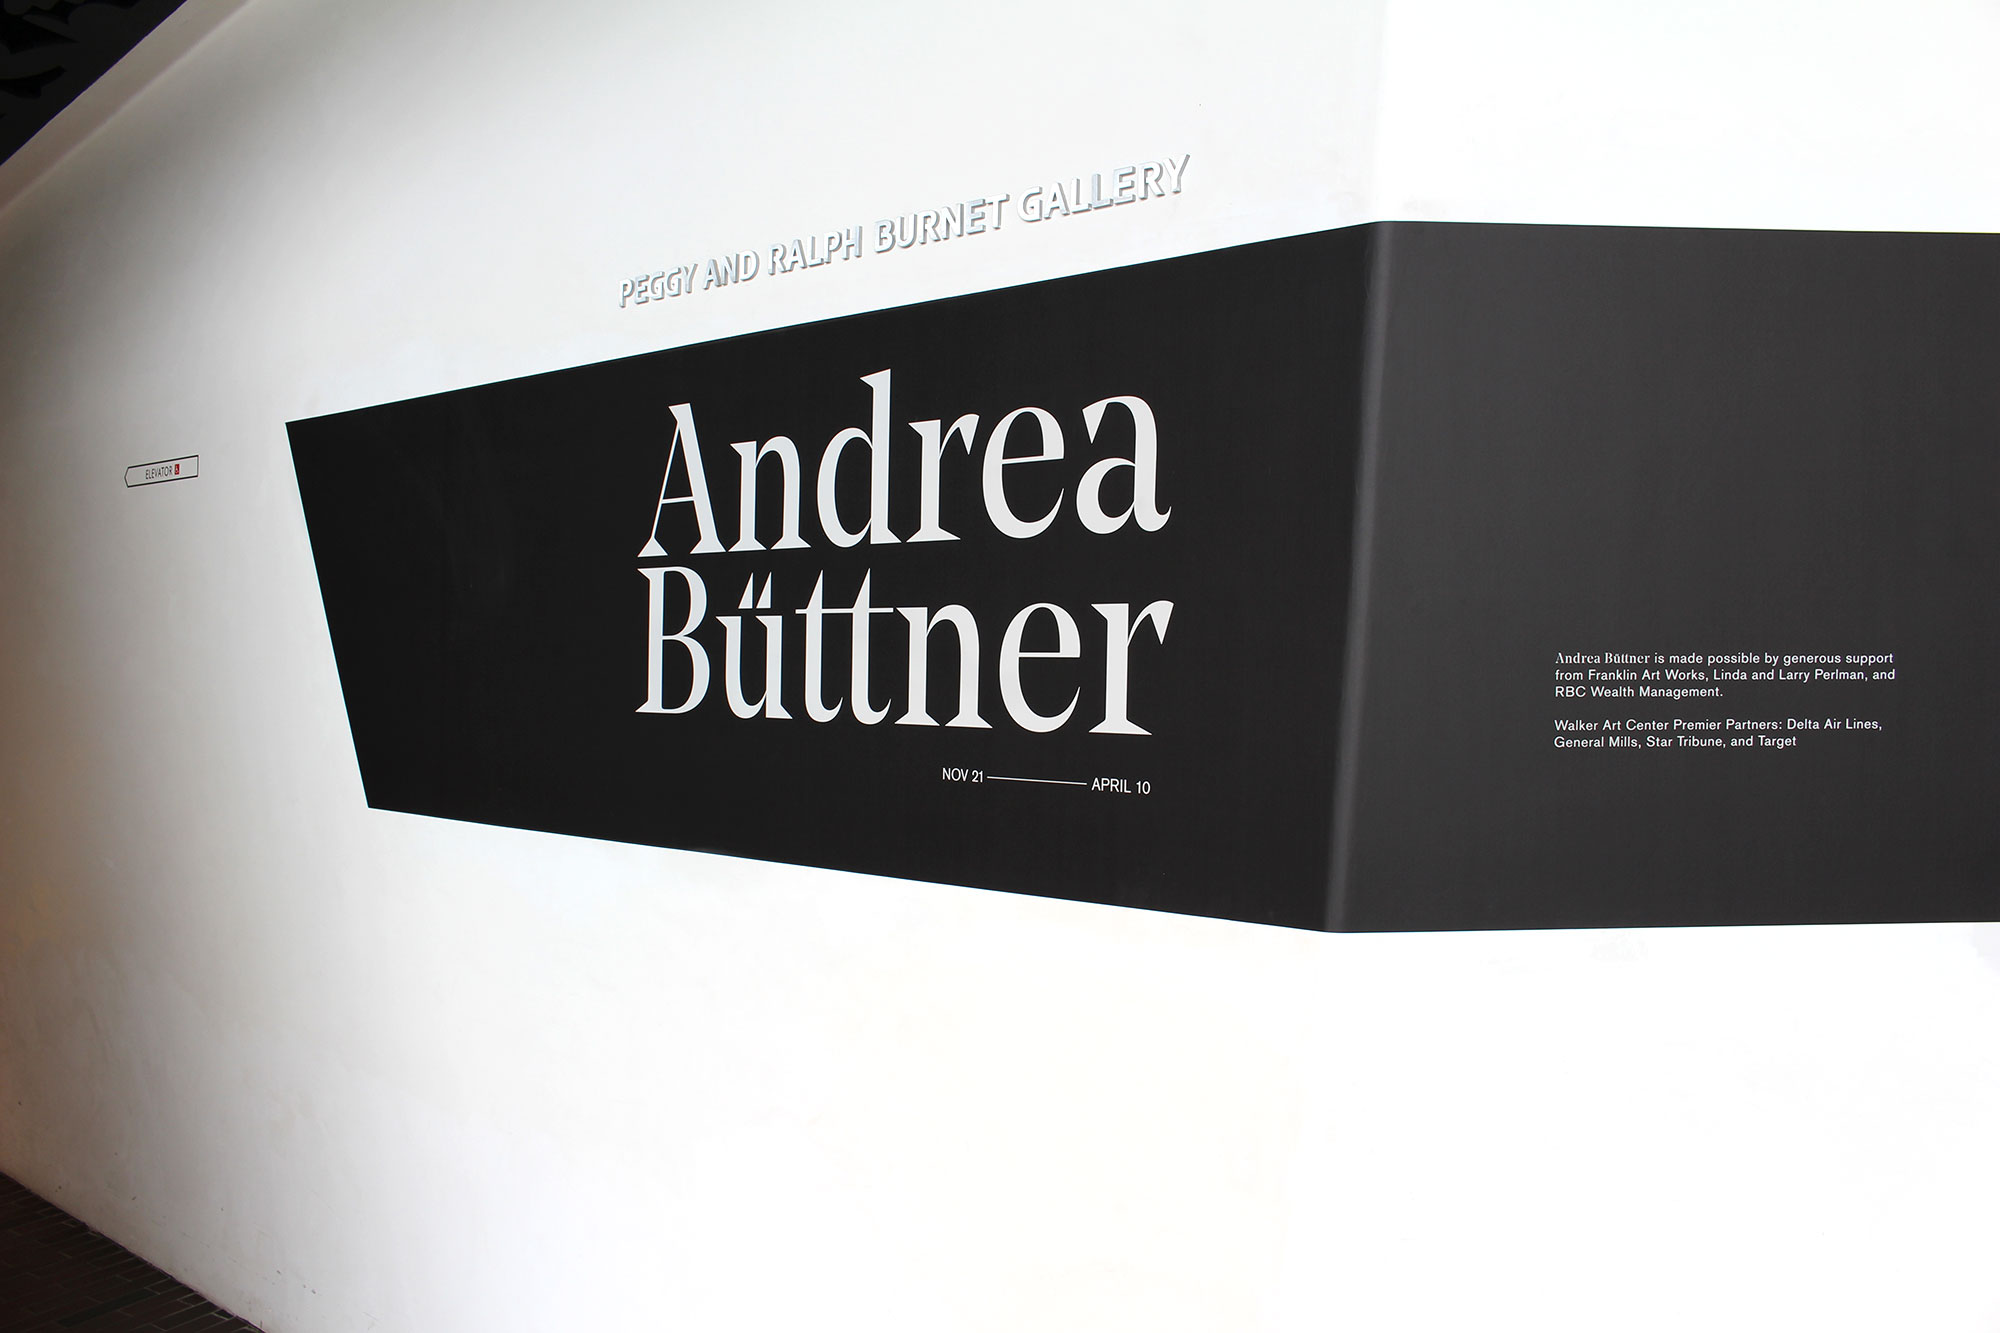 butner_22